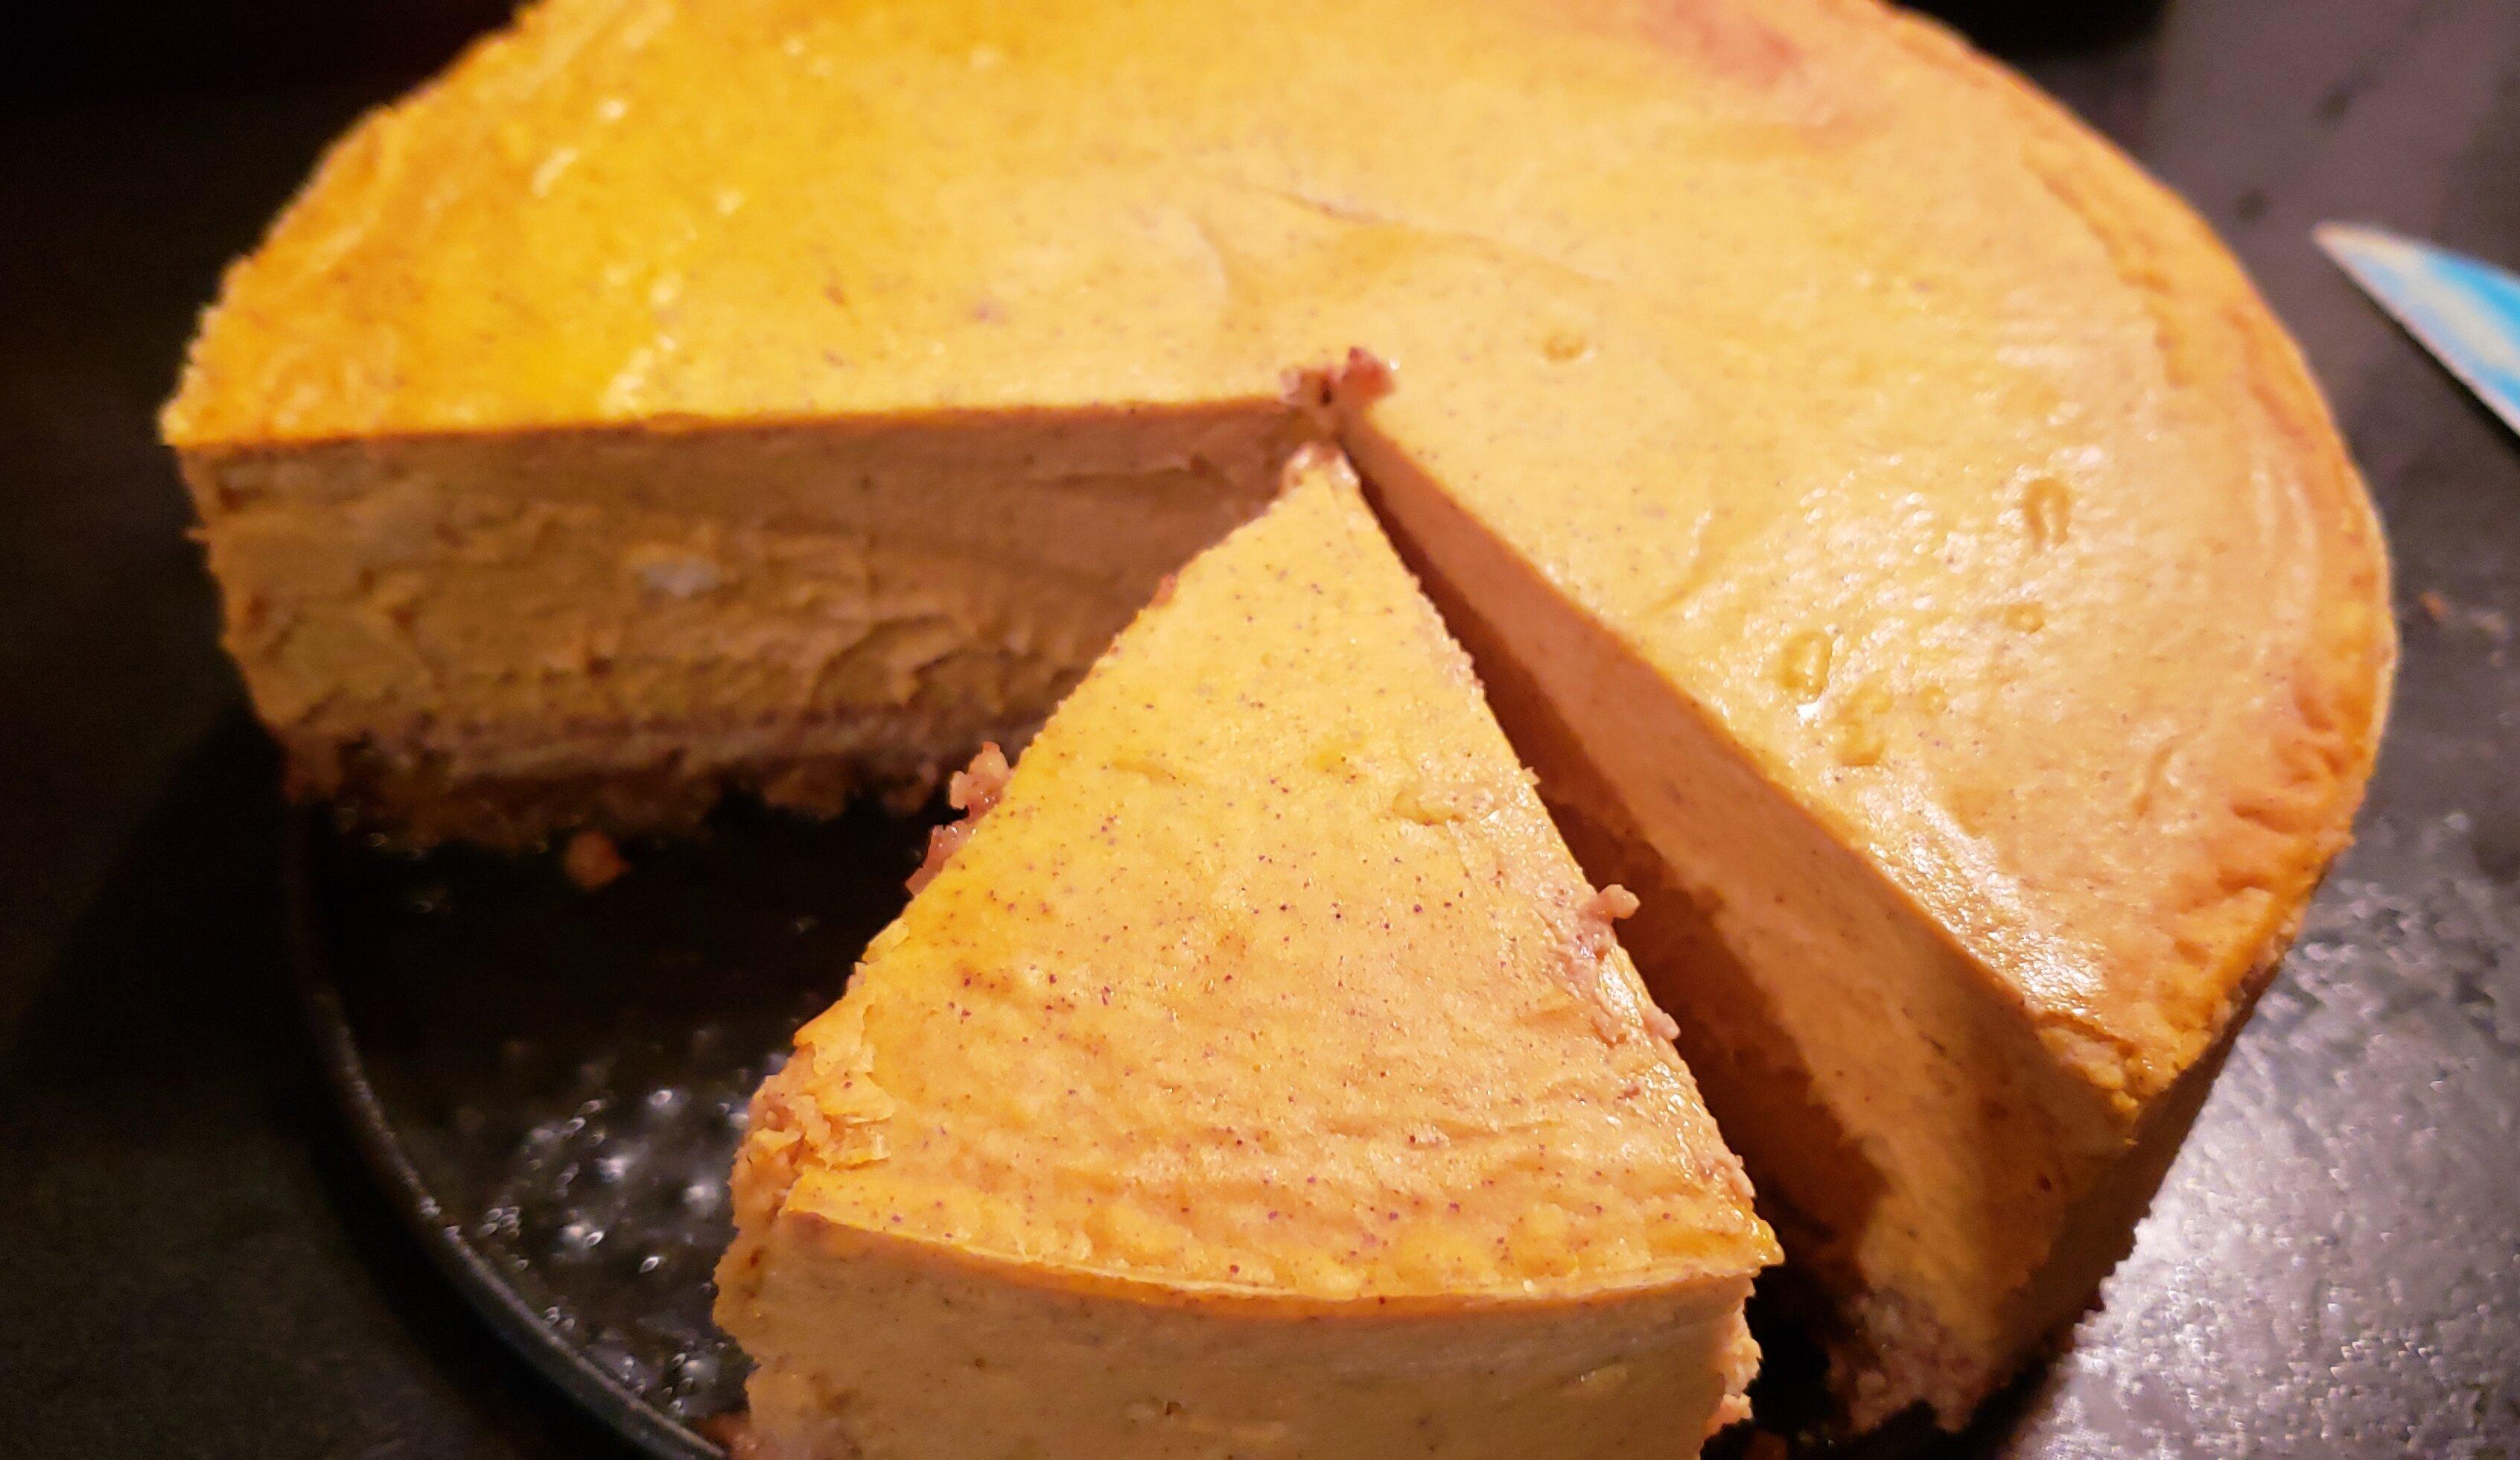 back to keto pumpkin cheesecake with almond pecan crust recipe